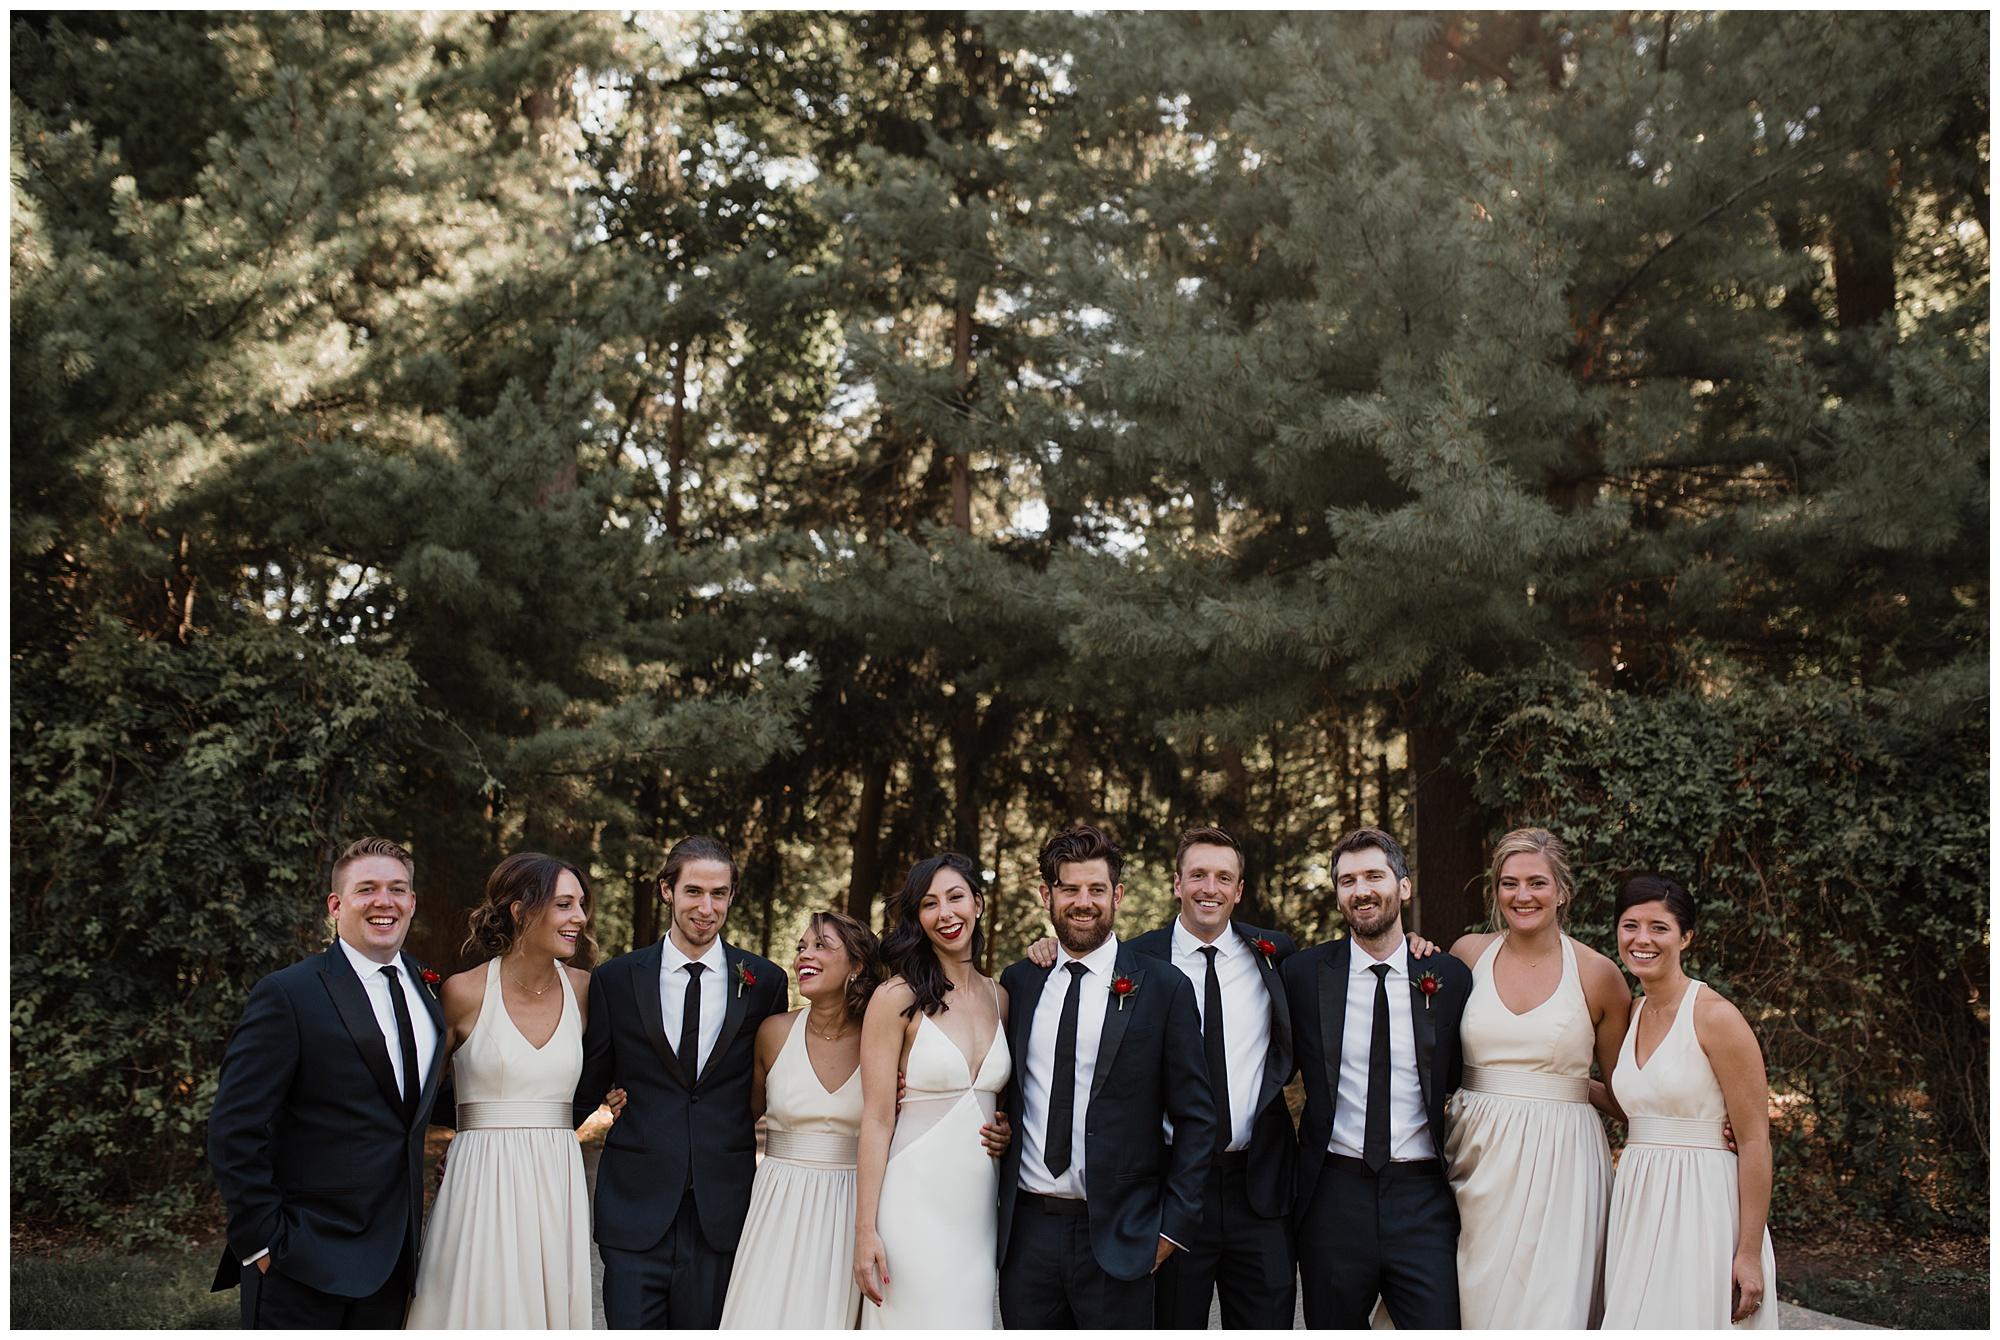 allerton_park_wedding_champaign_il_chicago_wright_photographs_ne_0079.jpg